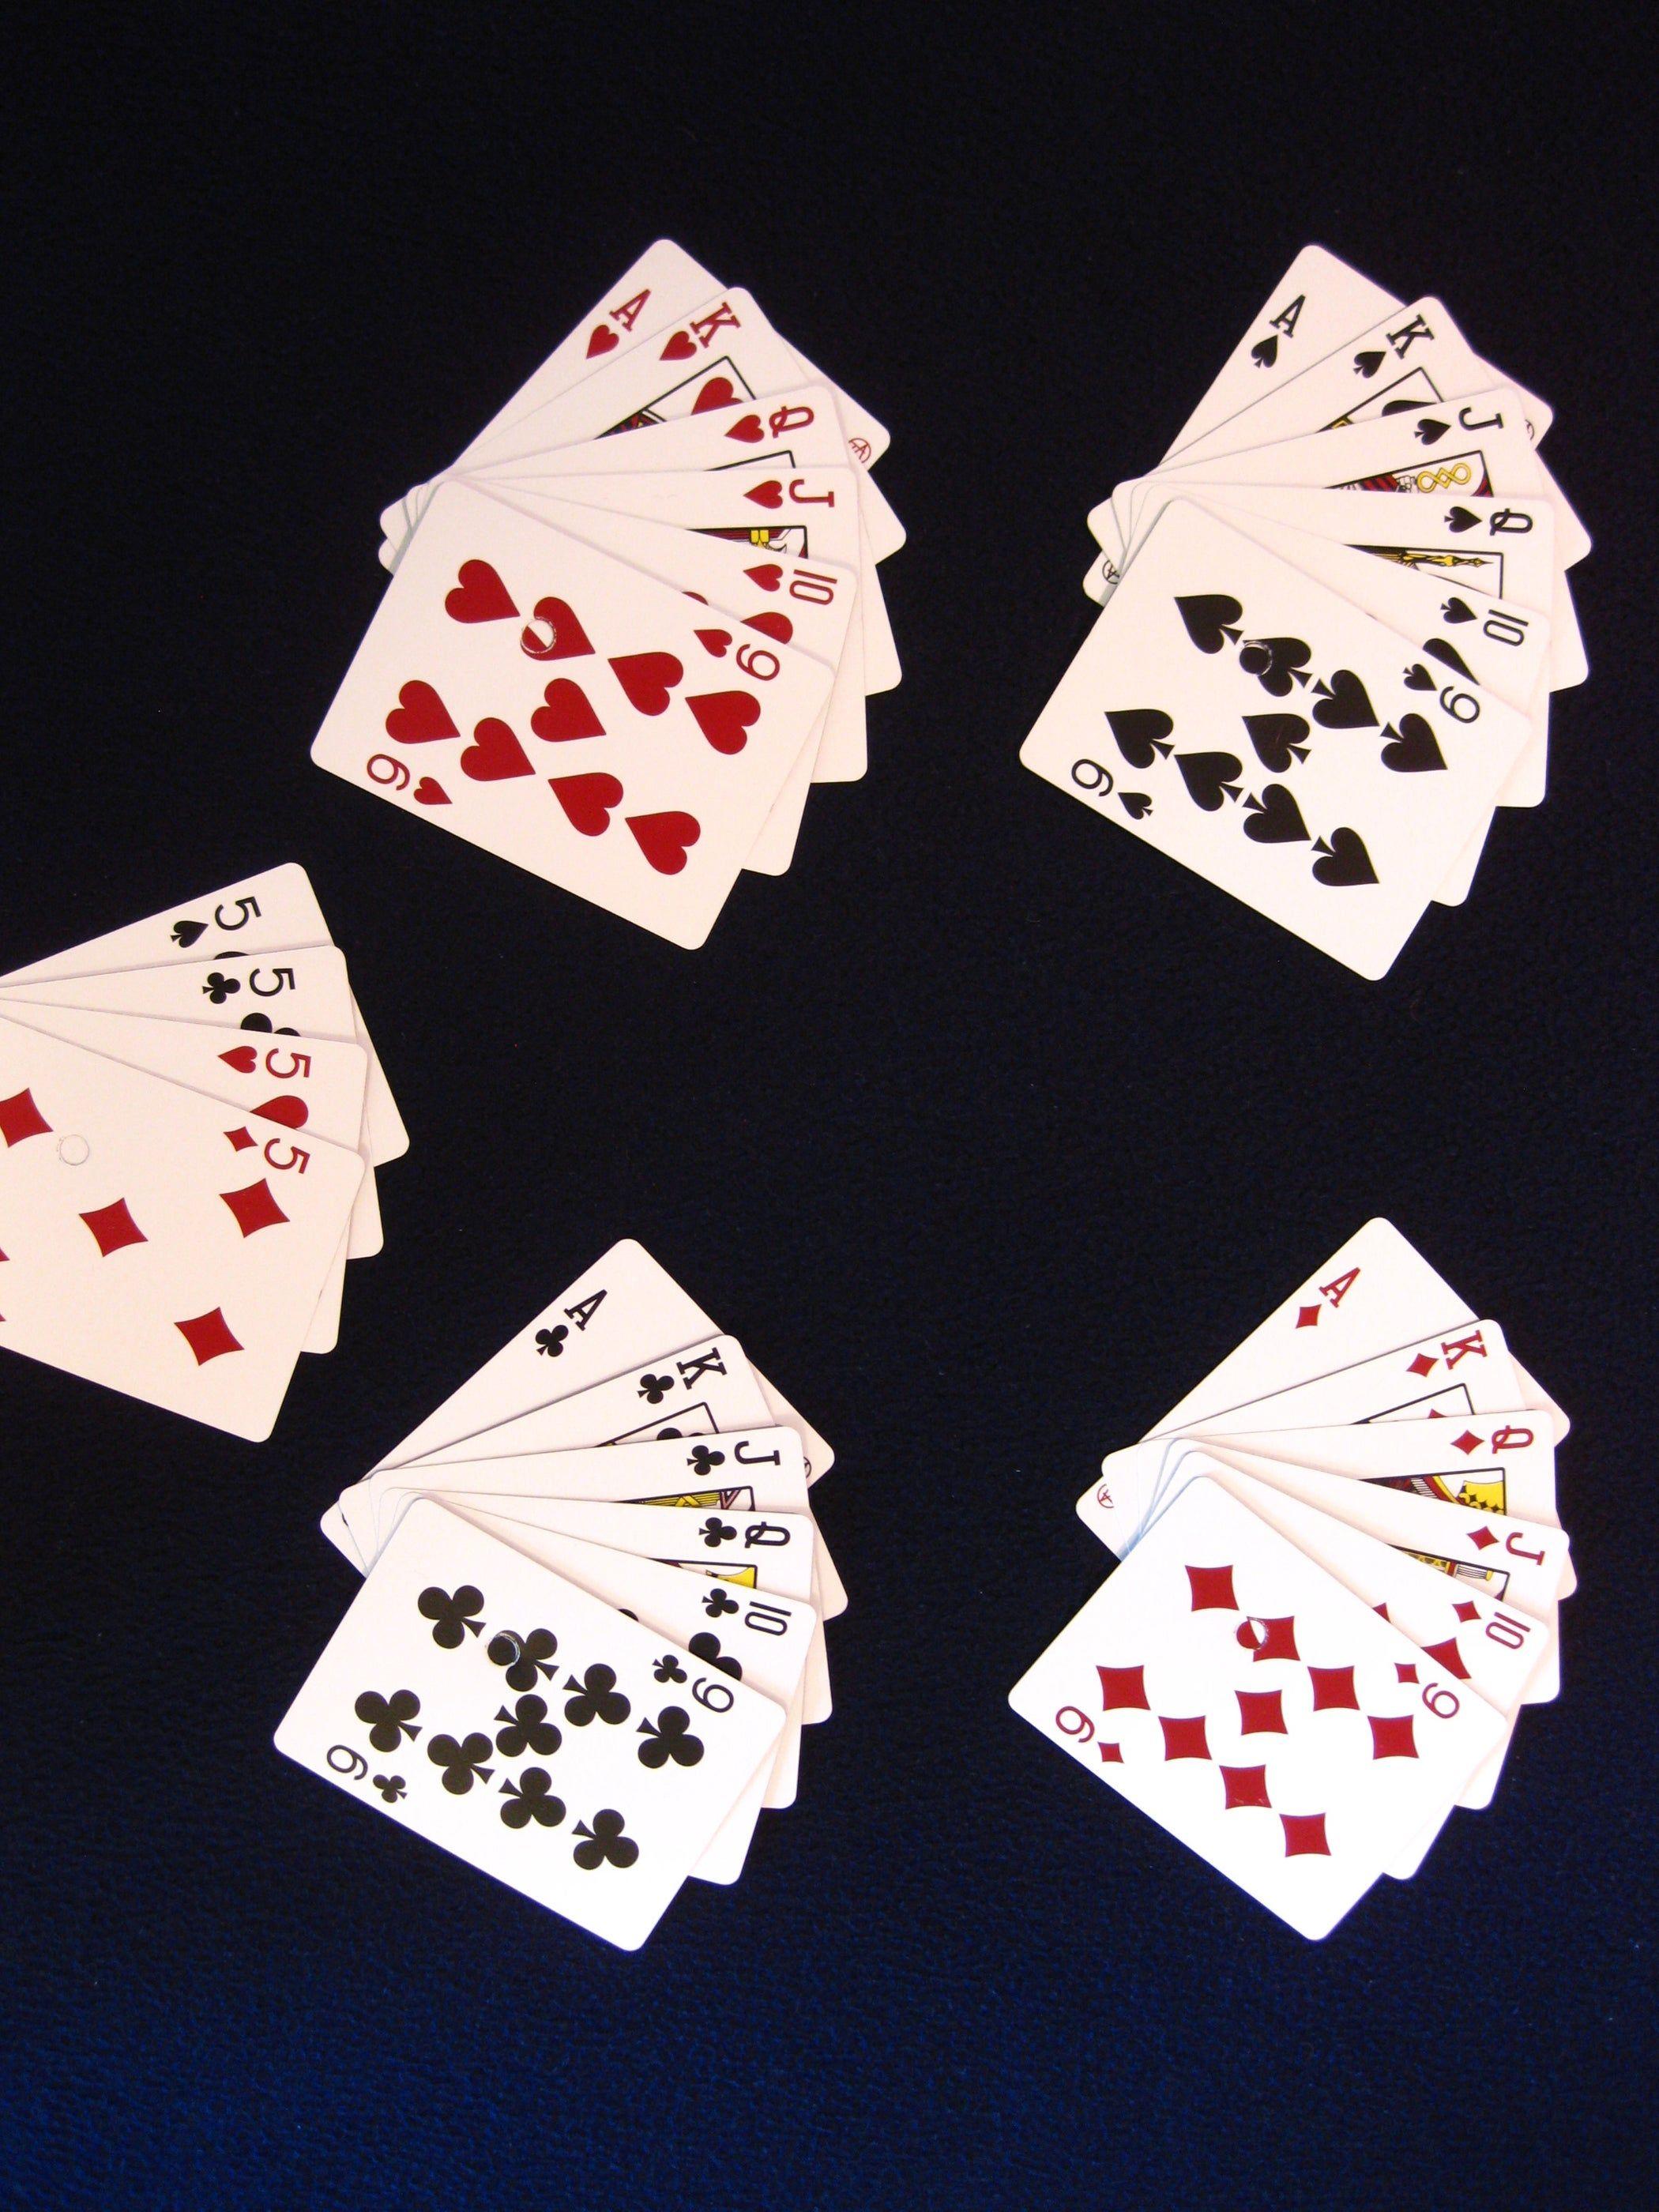 Euchre 101 Fun card games, Family fun games, Playing